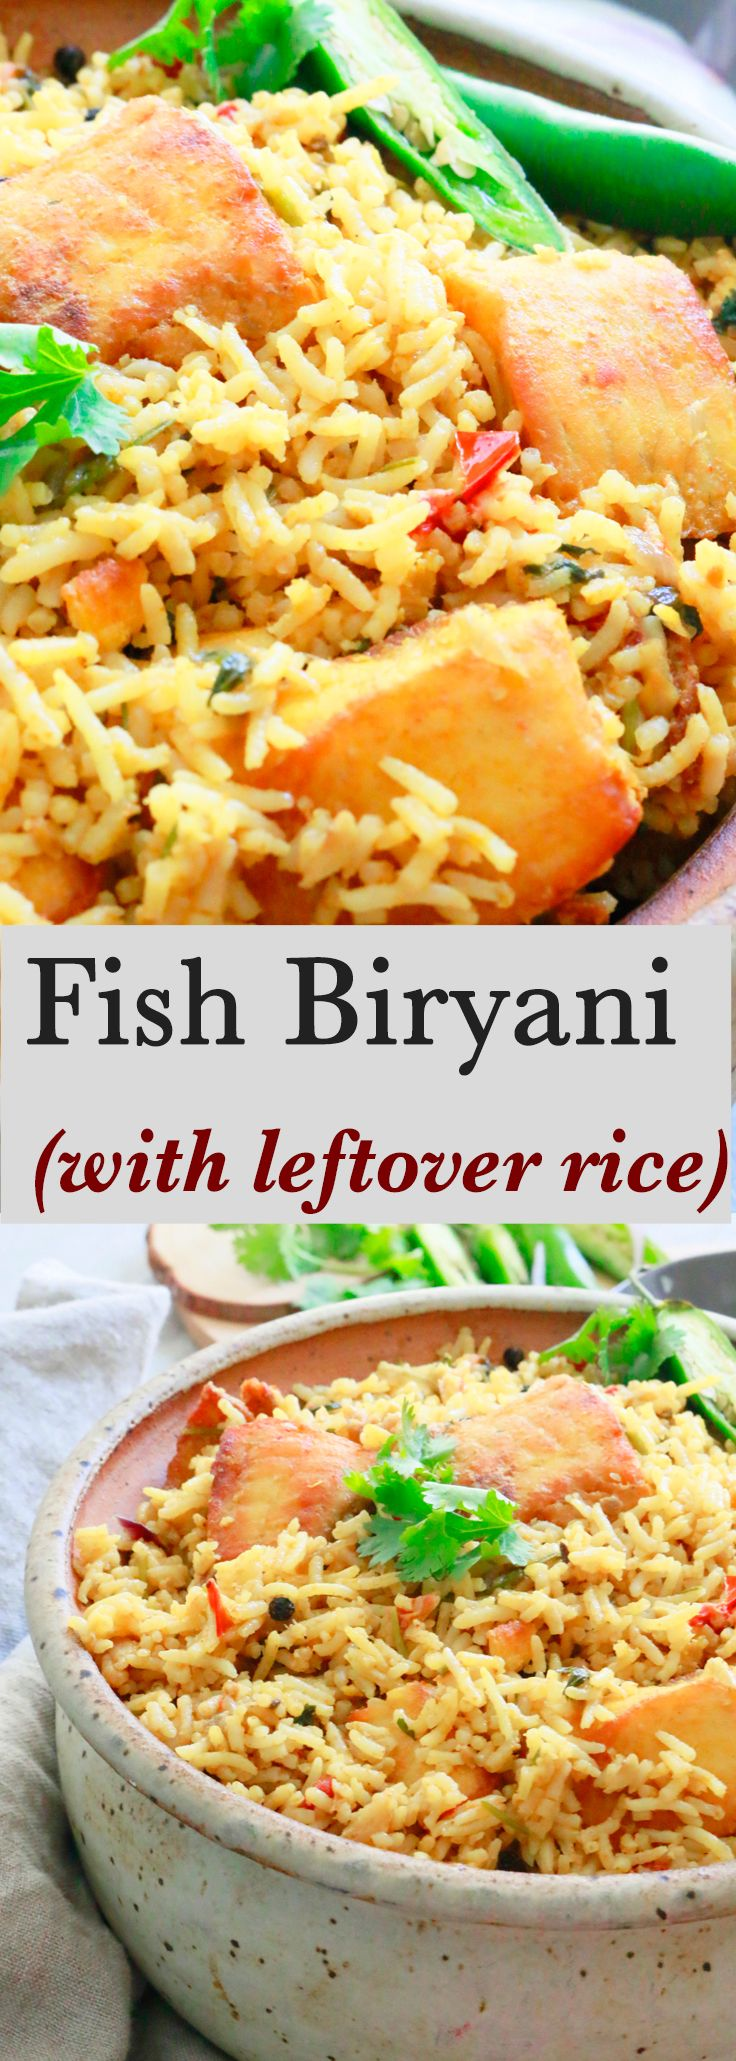 1314 best food hacks group board images on pinterest for Leftover fish recipes